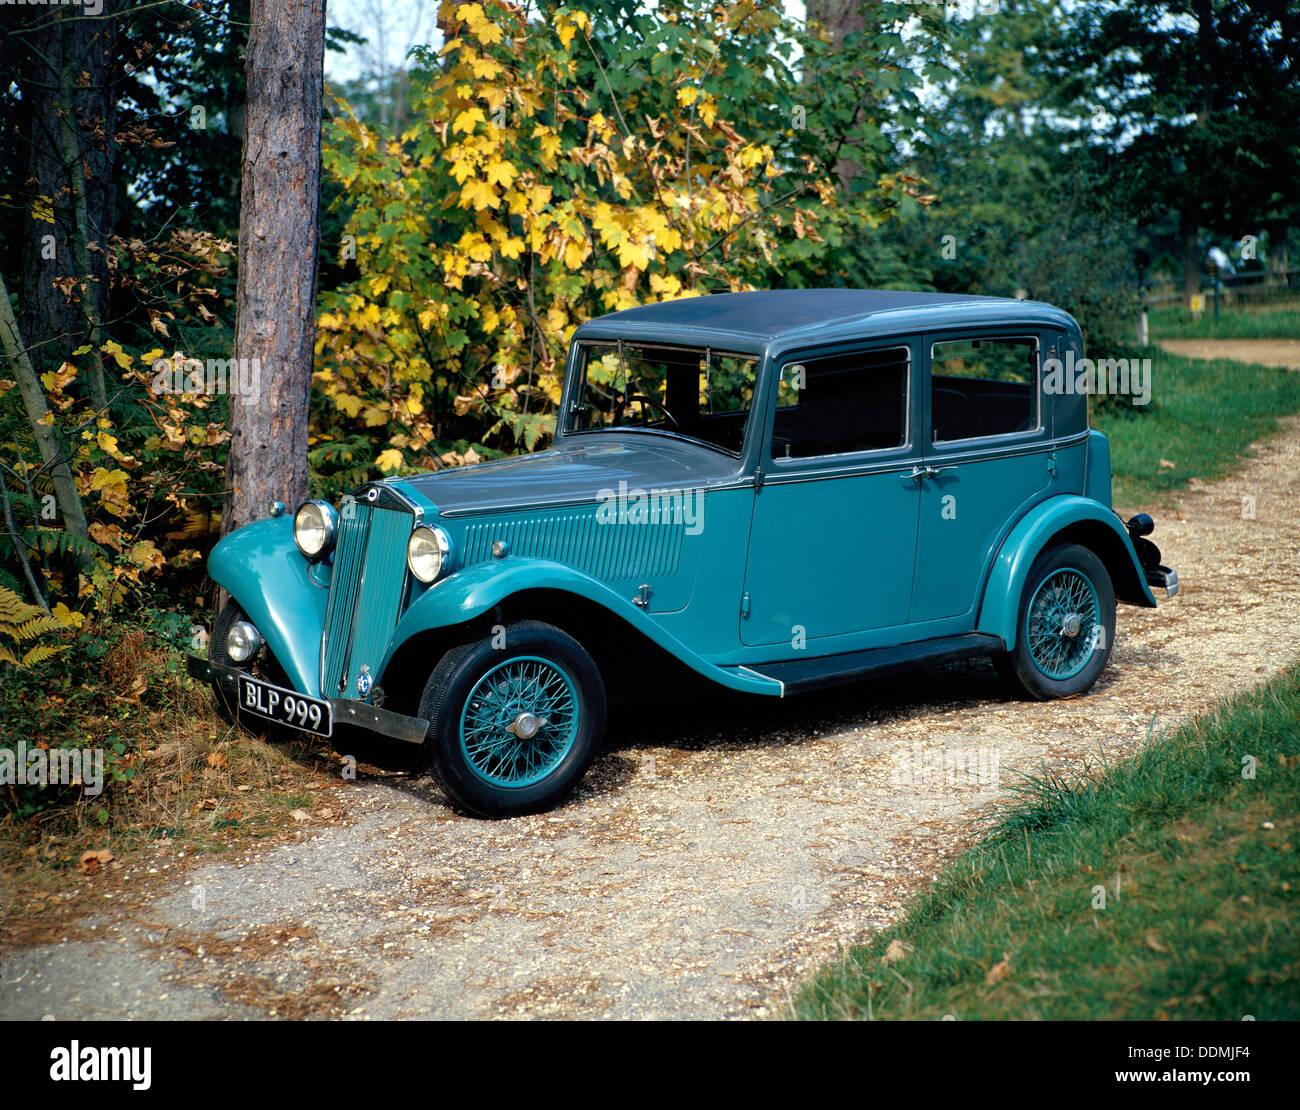 A 1934 Lancia Augusta. - Stock Image